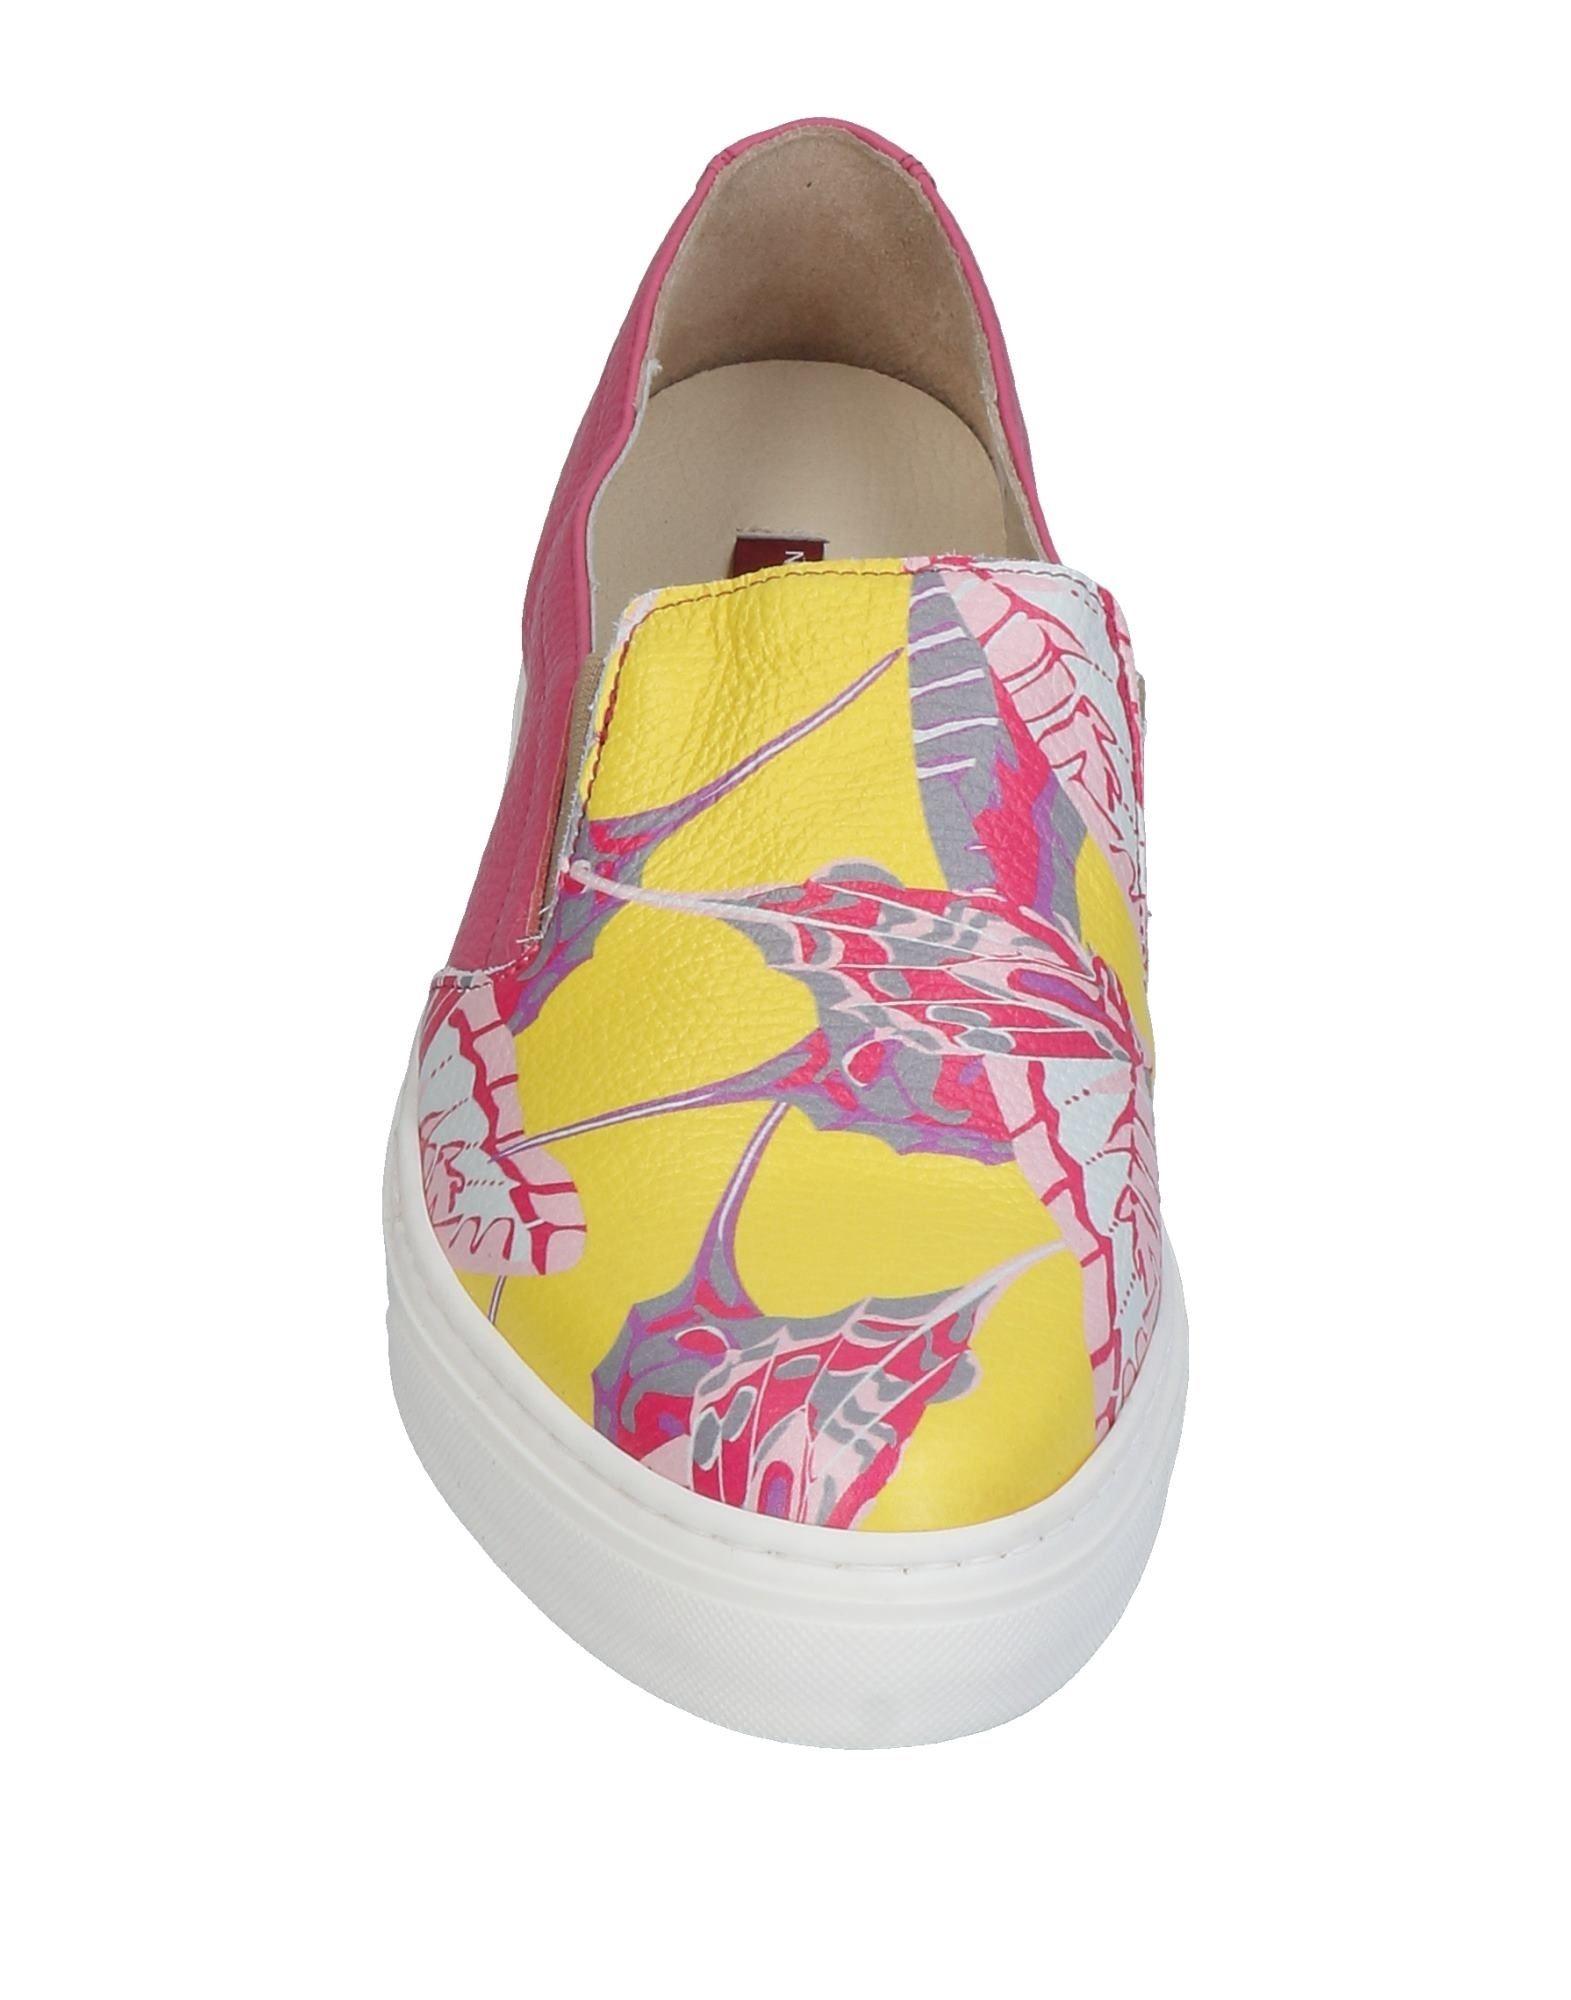 Nannini Sneakers - Women Nannini Sneakers online on on on  Canada - 11460115EG b9d4ea